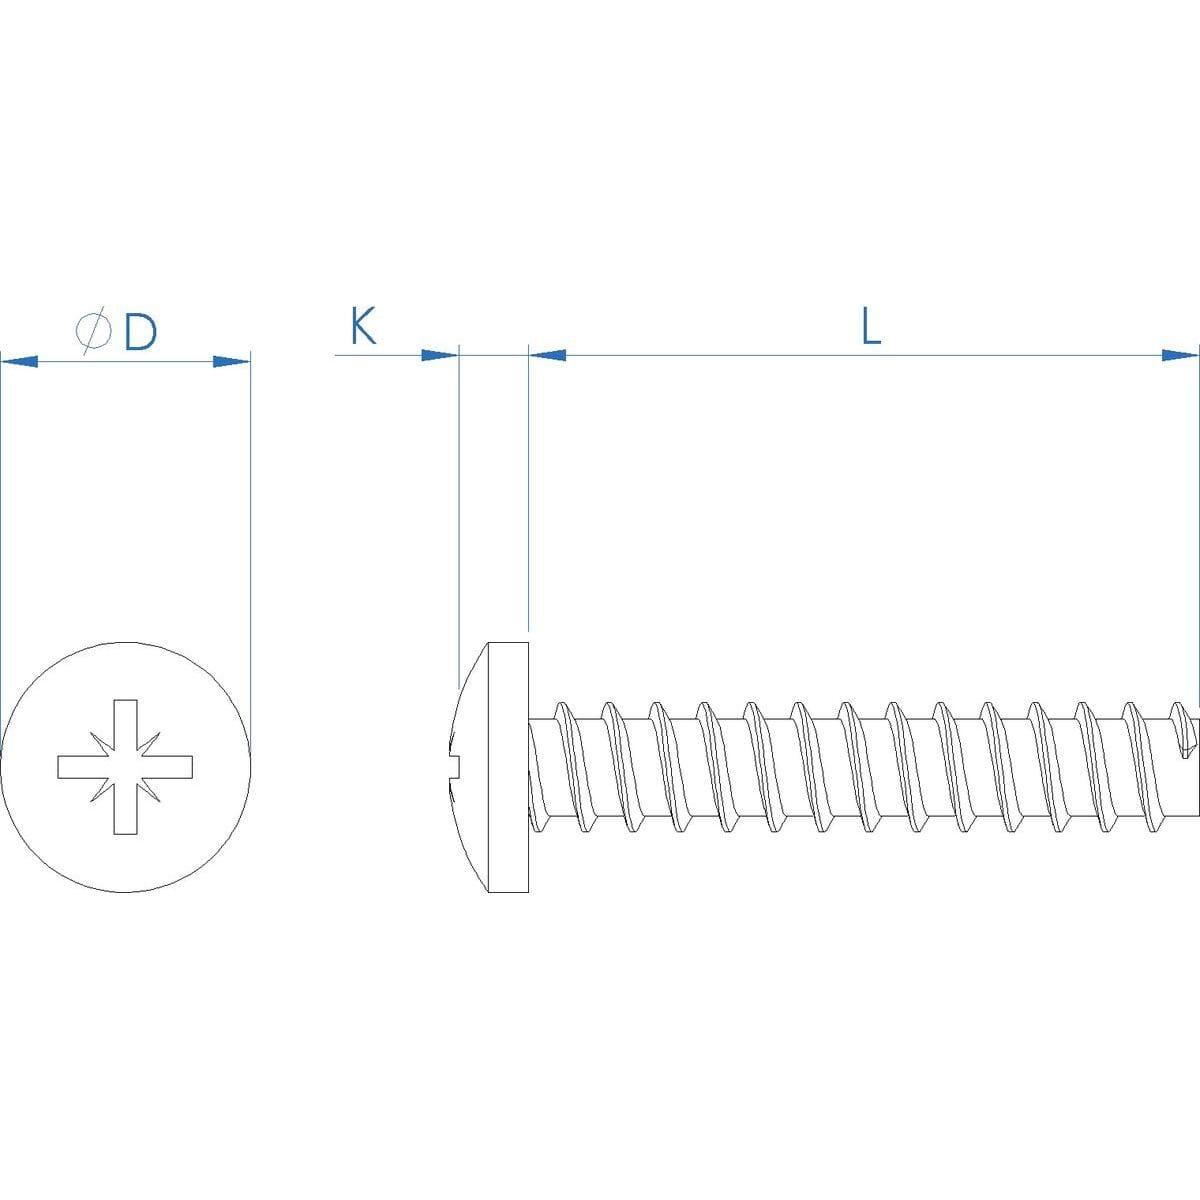 4mm x 10mm Pozi Pan Head Polyfix (30) Screws - Stainless Steel (A2) Drawing